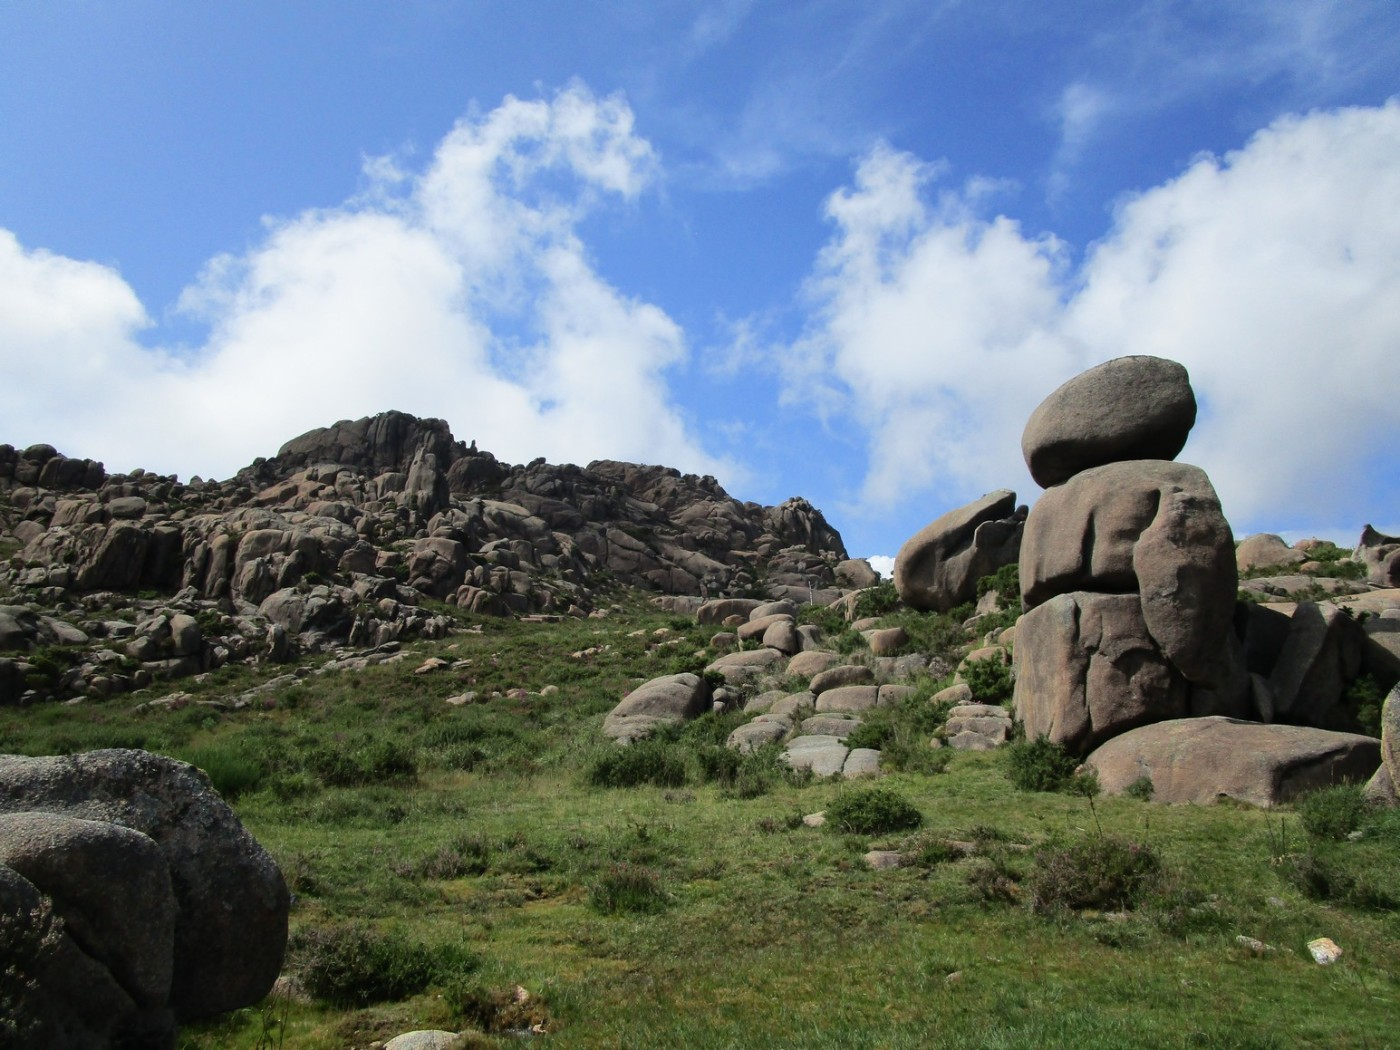 A Pedra do Guerreiro